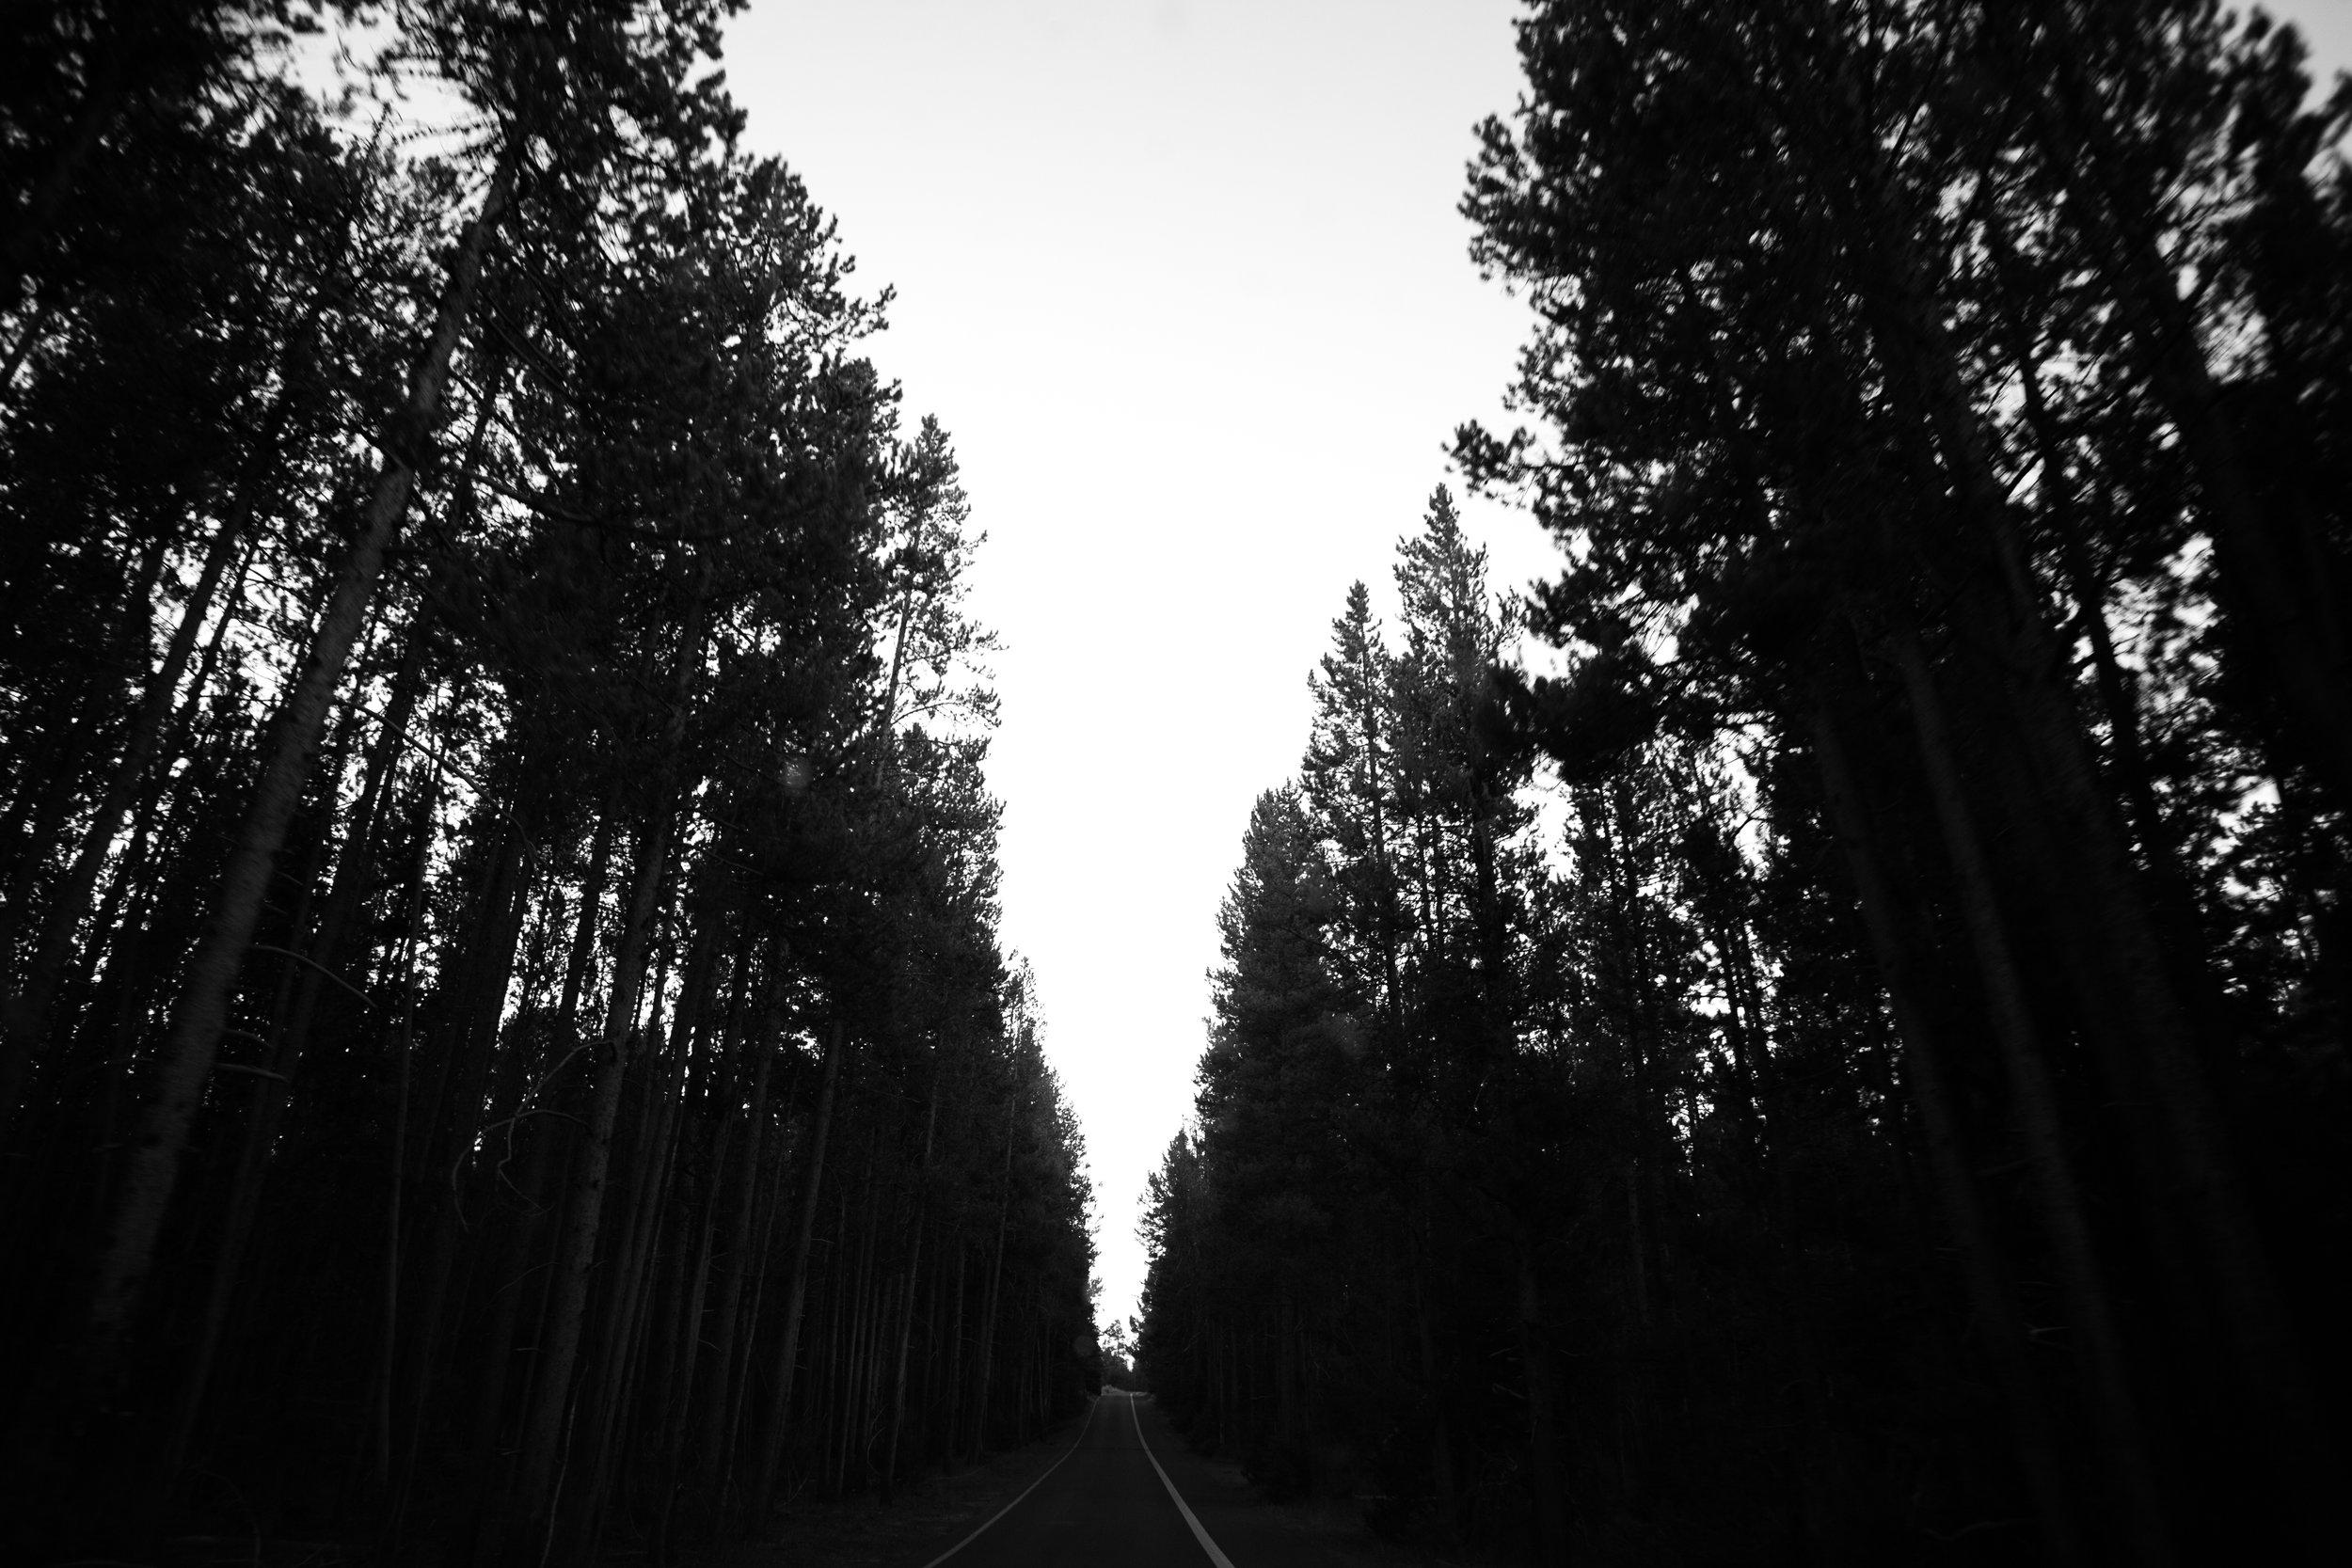 Chacon Images_RoadtripUSA_pt2_Print_-1648.jpg